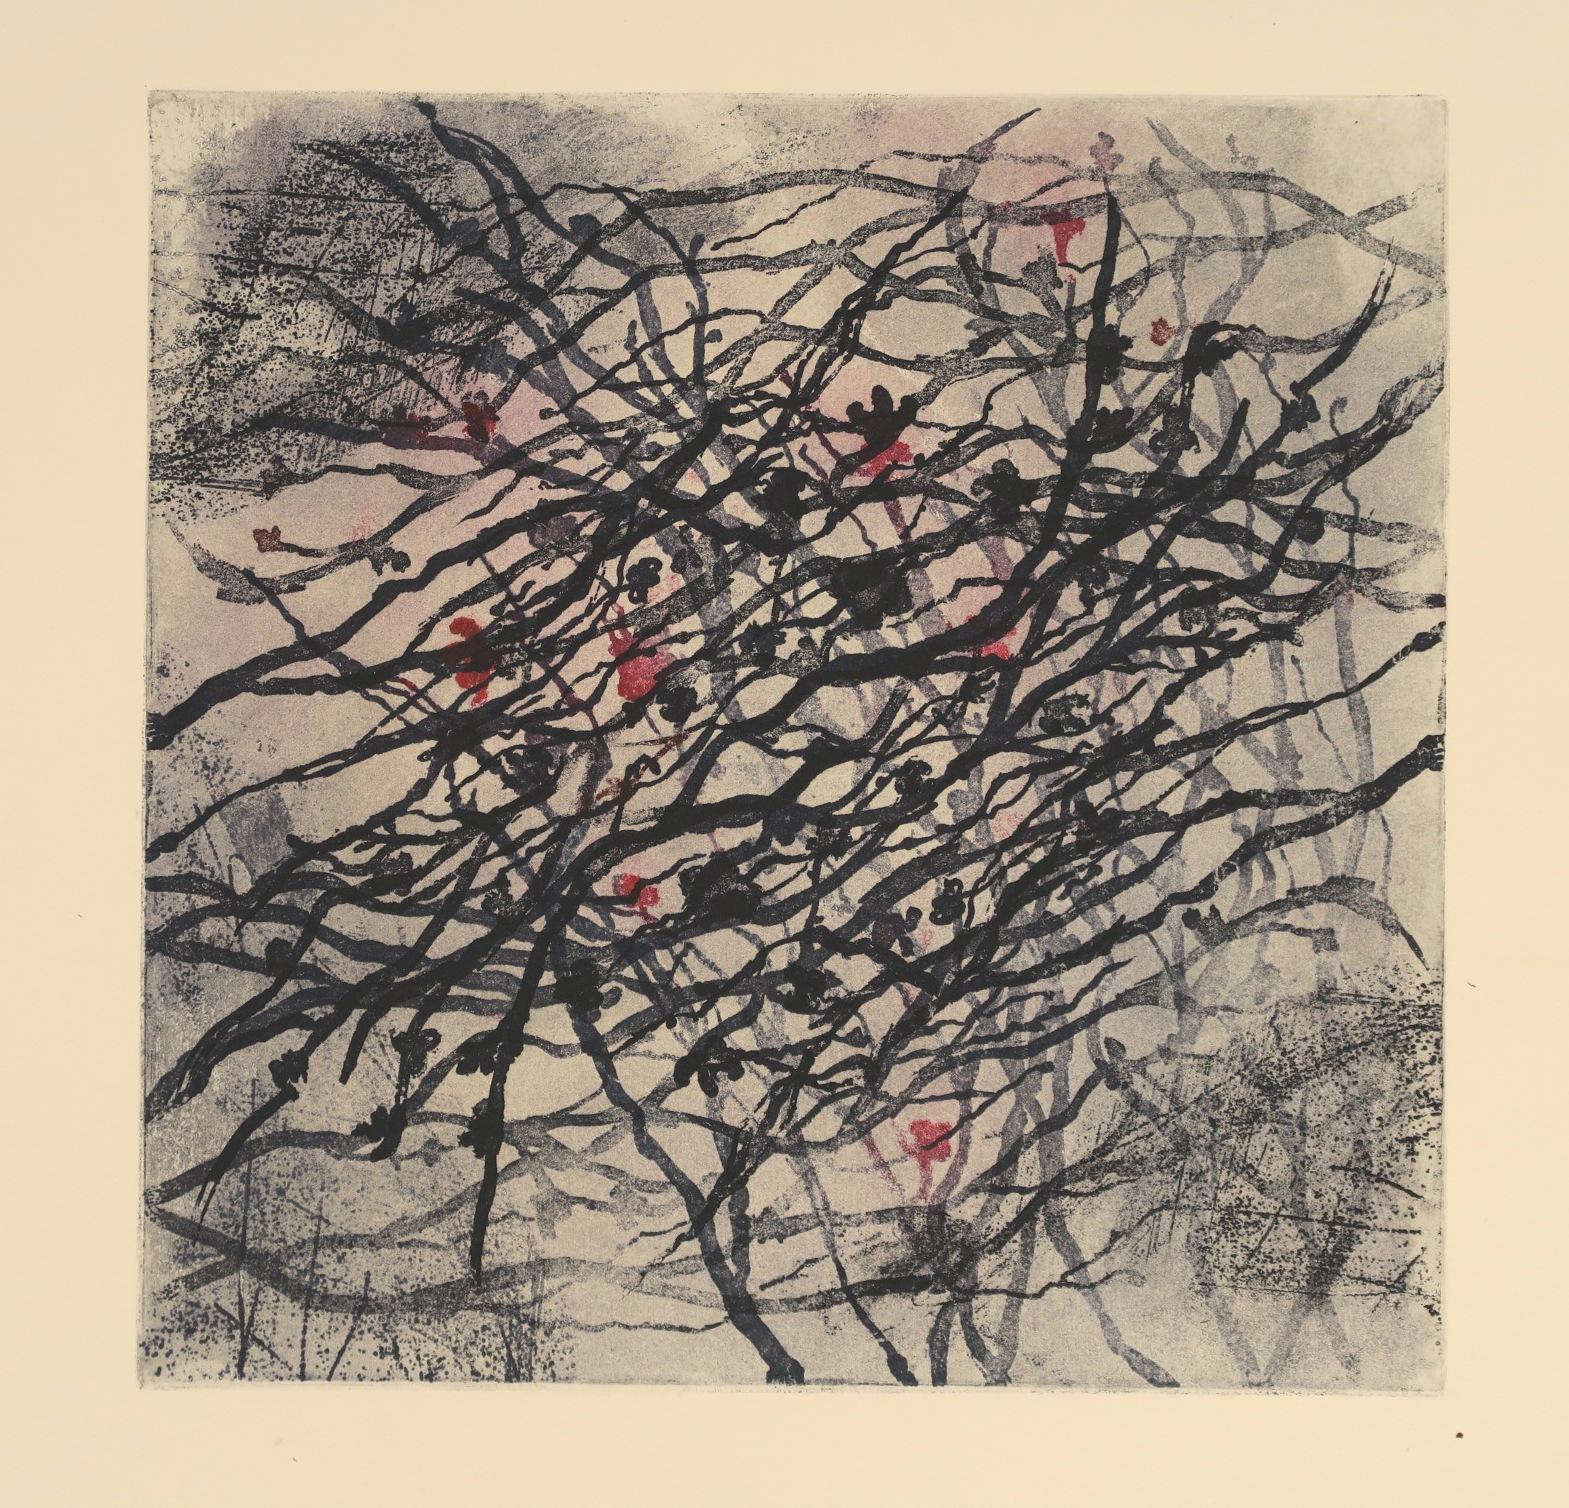 Blind Woman's Garden II_Gina McDonald_etching.JPG